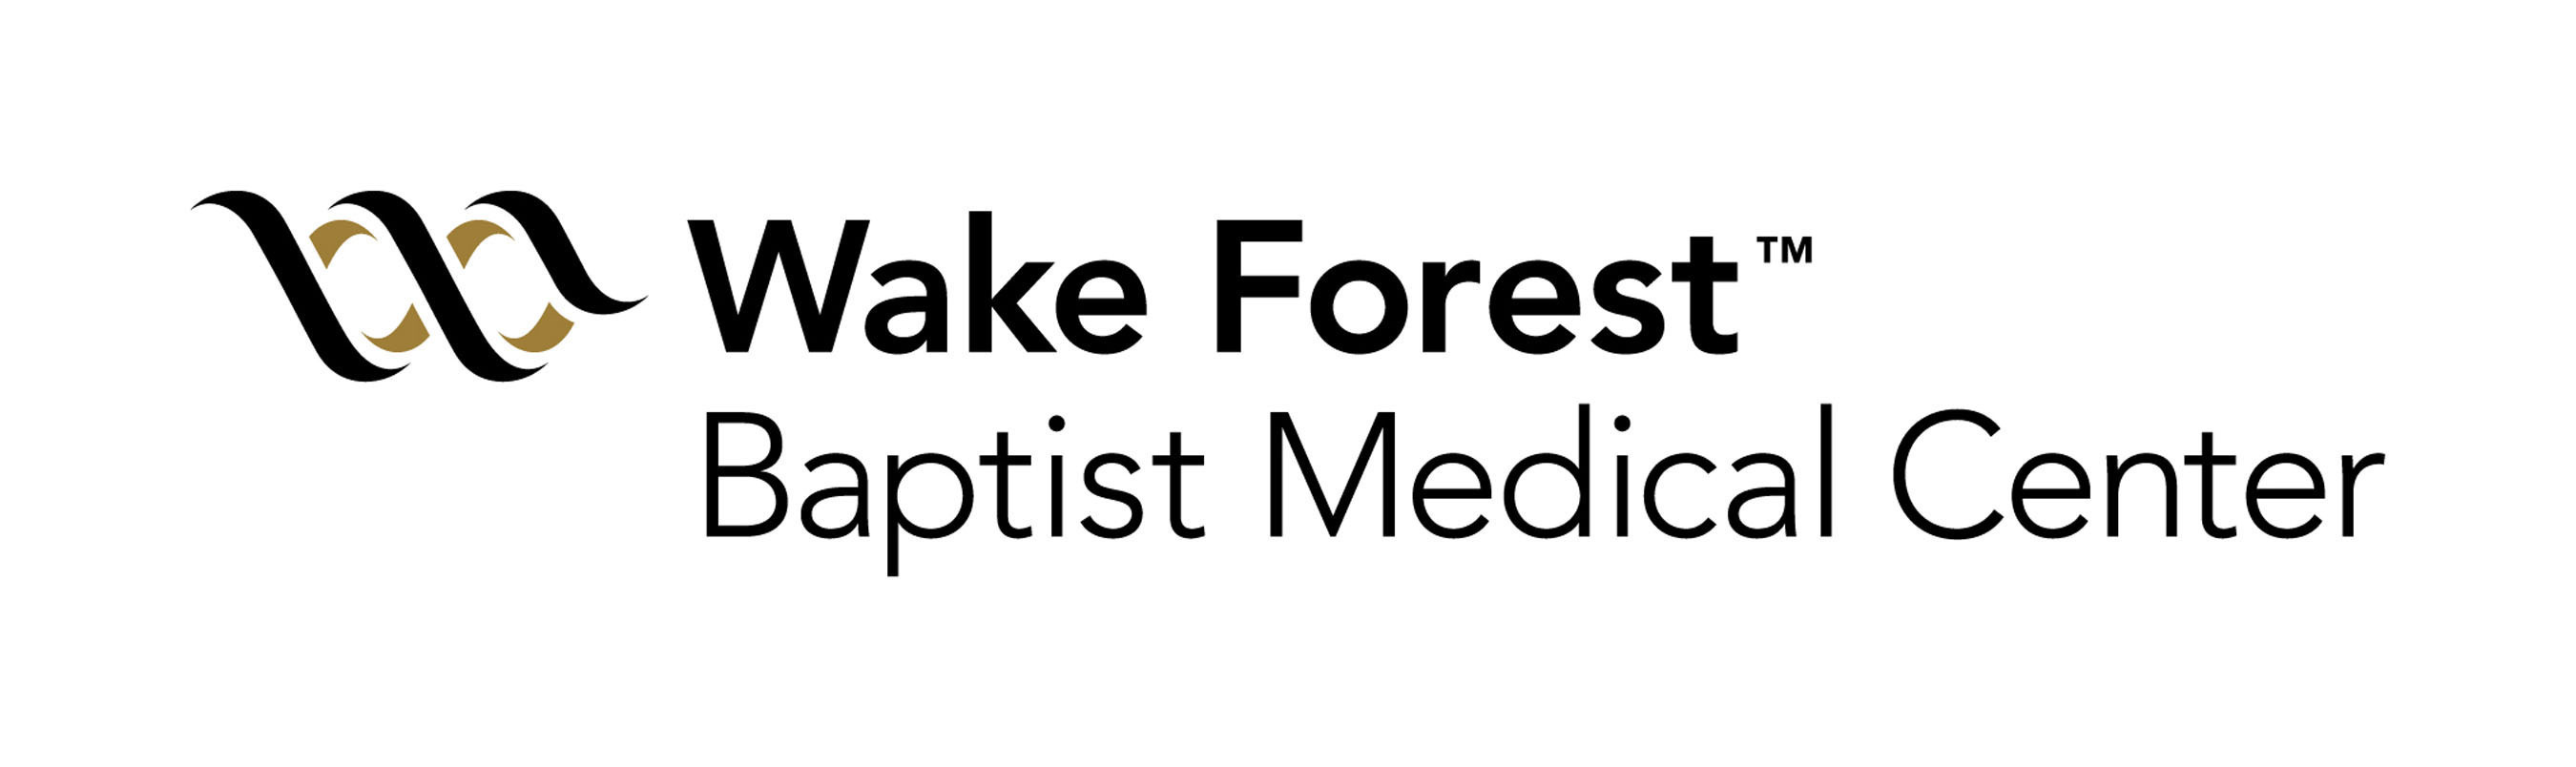 Wake Forest Baptist Medical Center logo.